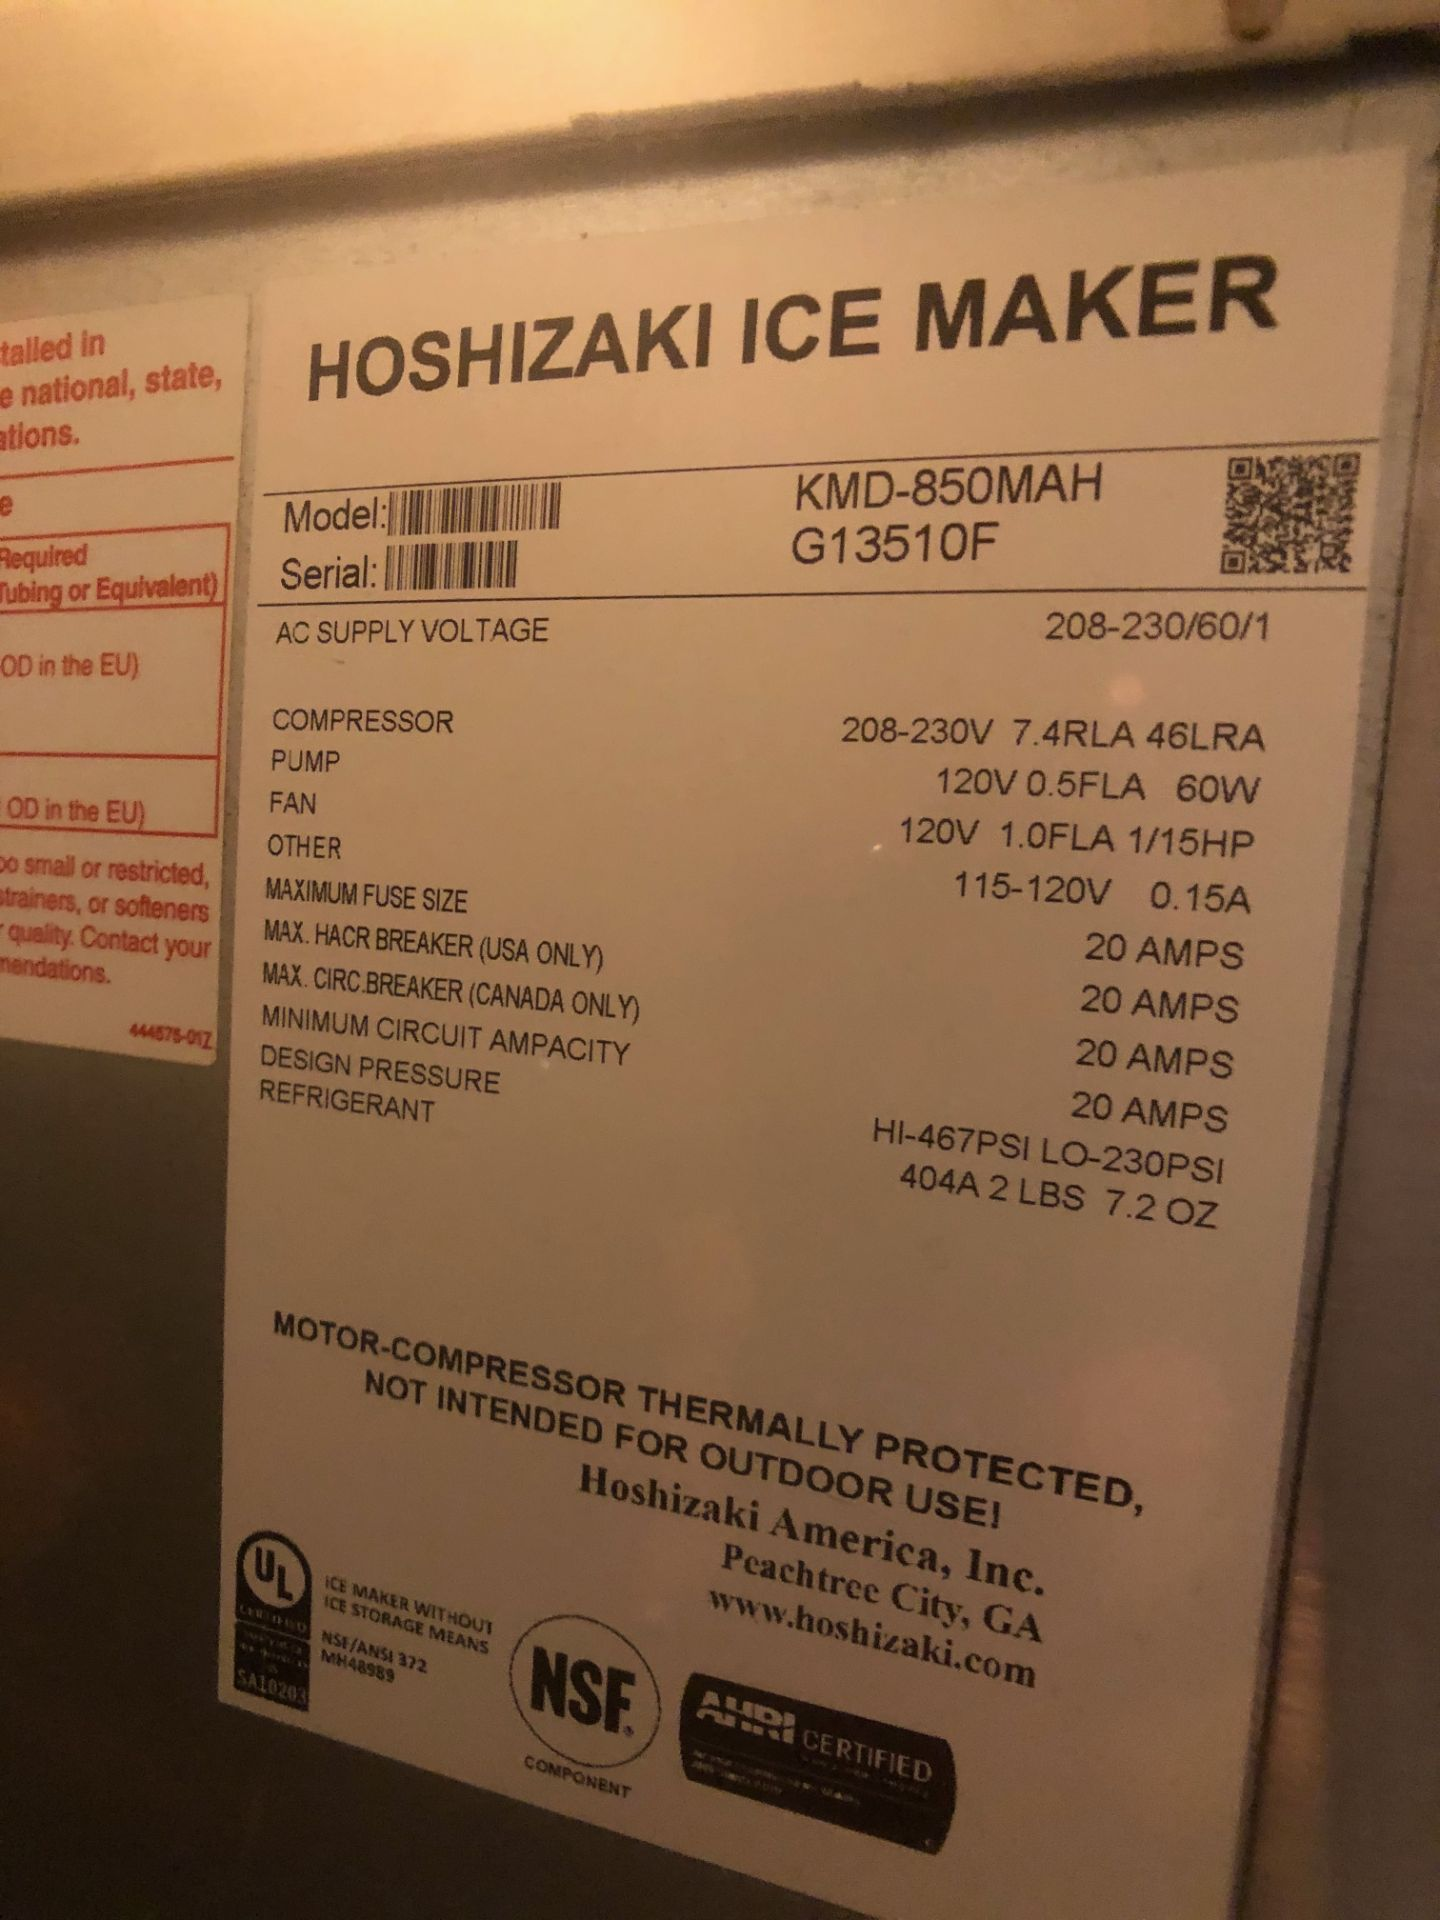 Manitowoc Beverage Systems 10-Valve Soft Drink Dispenser, Model SV250, S/N 610202454, with Hoshizaki - Image 8 of 10